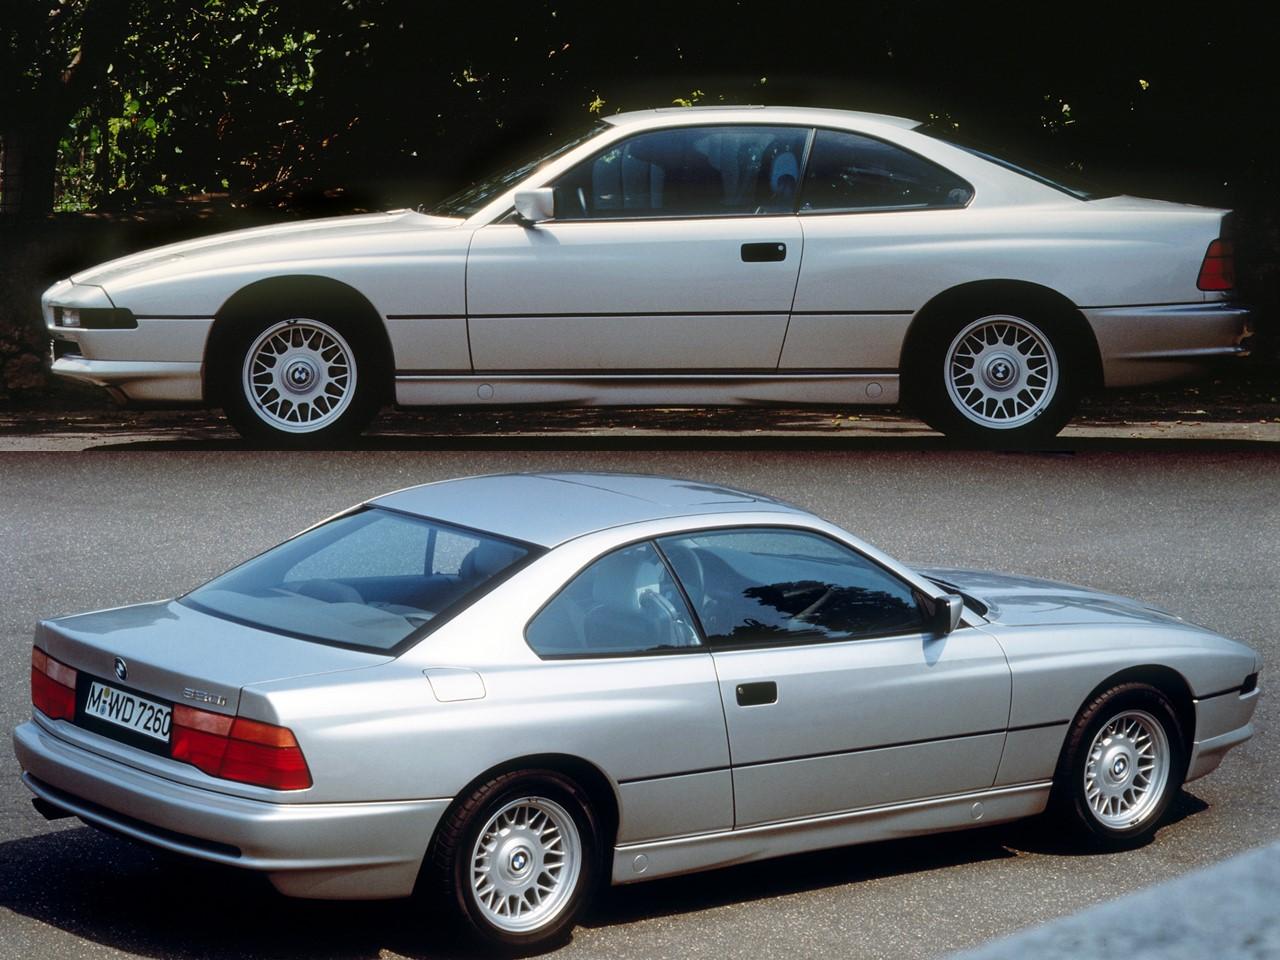 Bmw 850 Bmw 850 Csi Gta5 Bmw 850csi 1994 Bmw 850csi